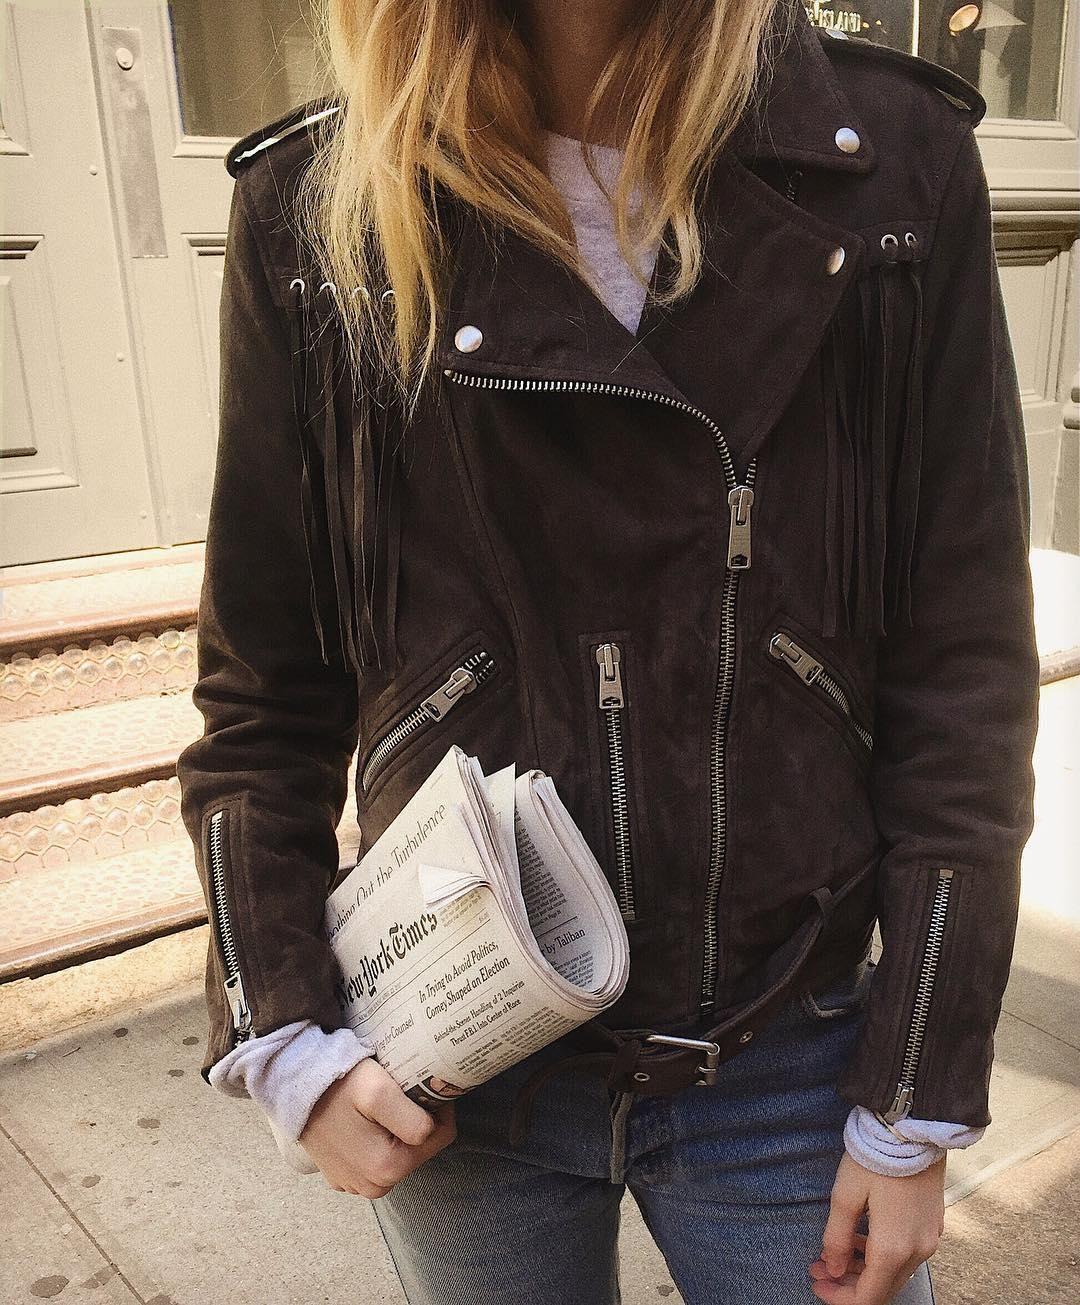 62bf0dc84b7 Christie Tyler wears her favourite staple item, the tassel Balfern suede  biker jacket.